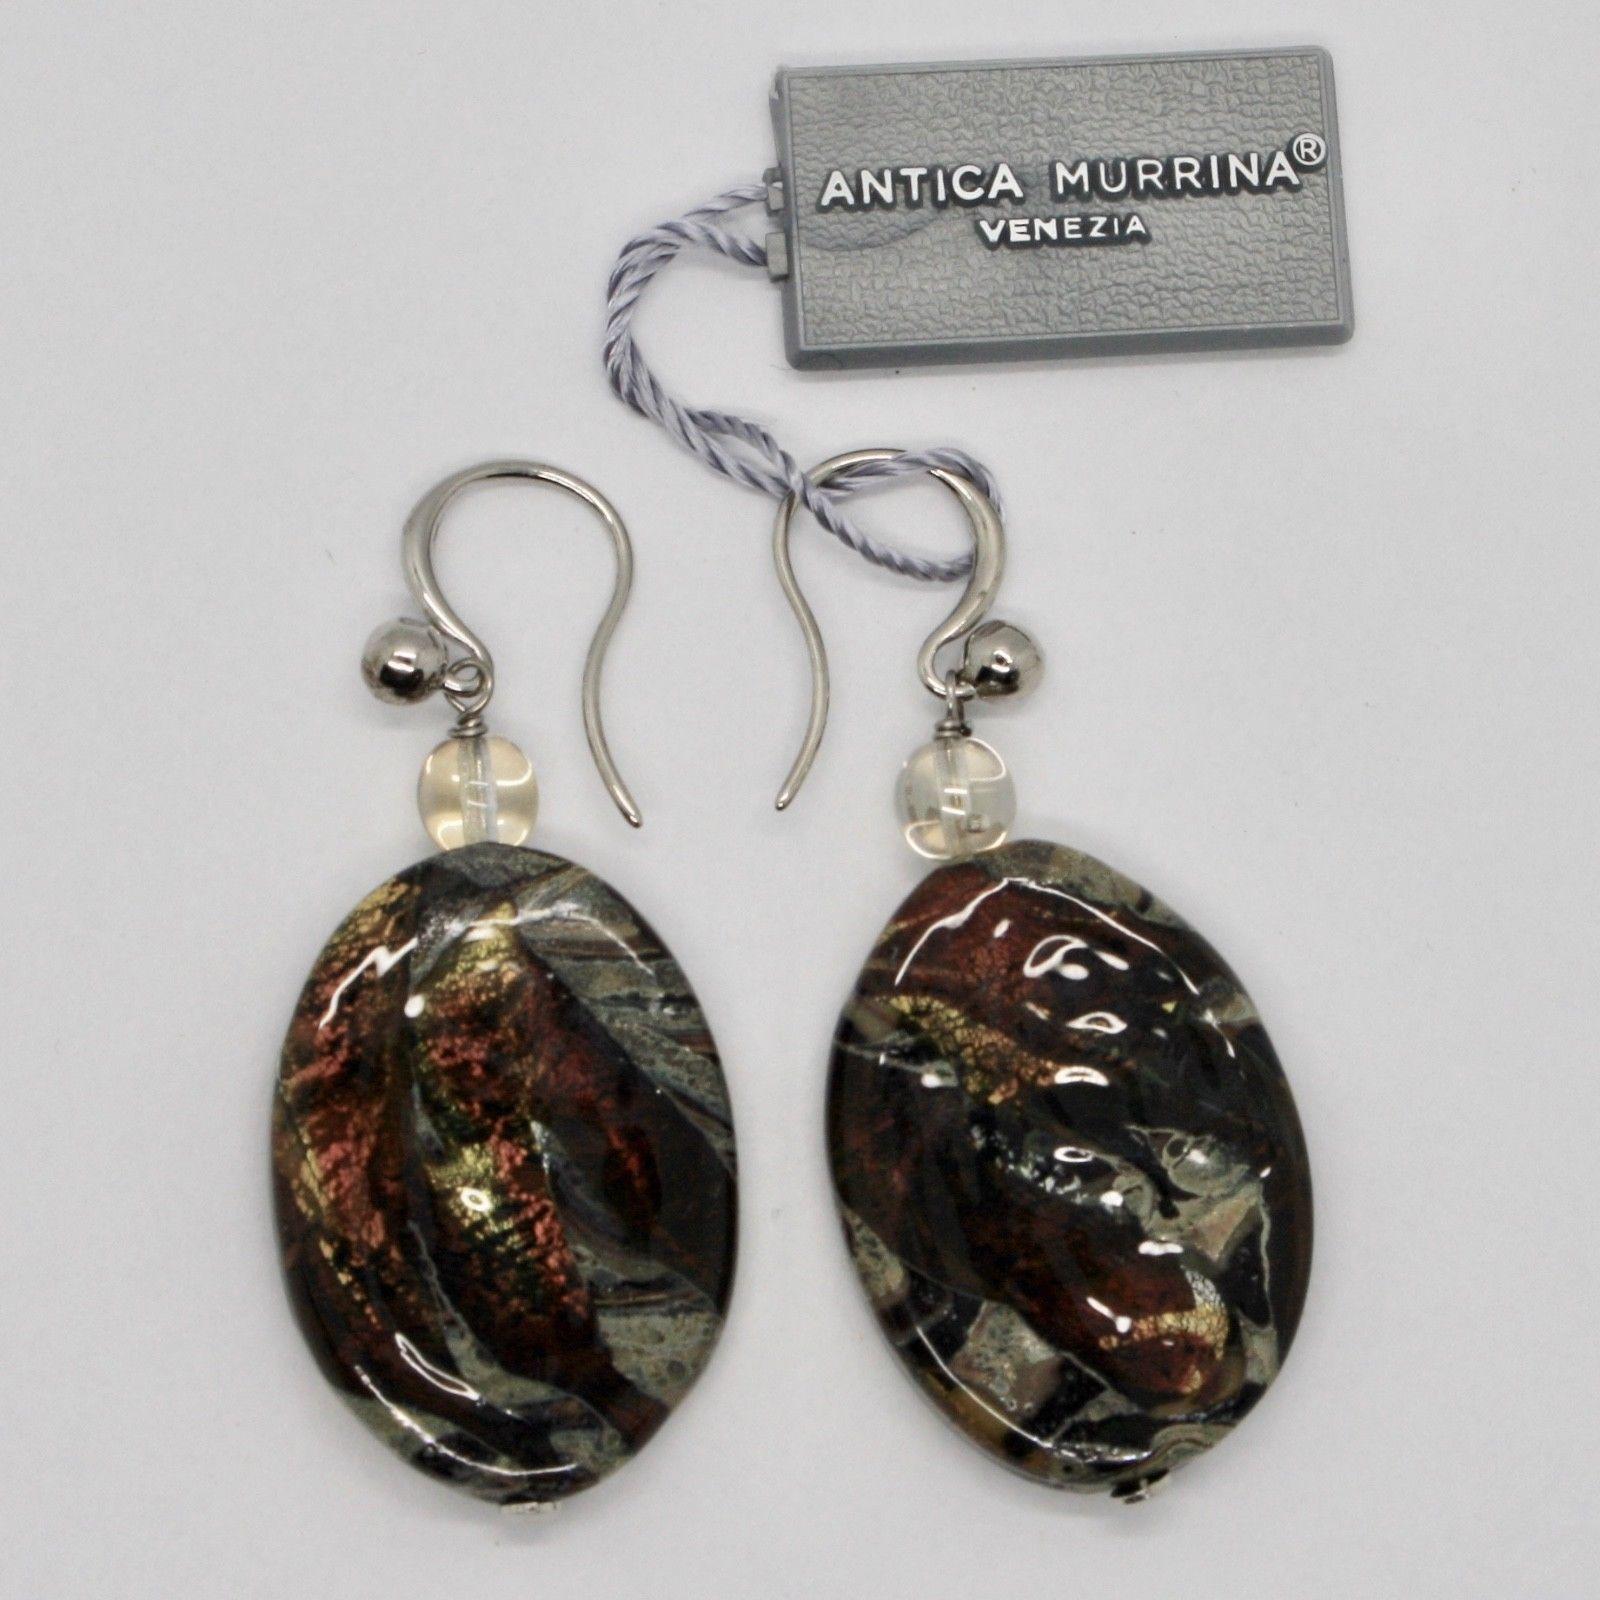 EARRINGS ANTICA MURRINA VENEZIA, MURANO GLASS BROWN RED BEIGE OR582A10